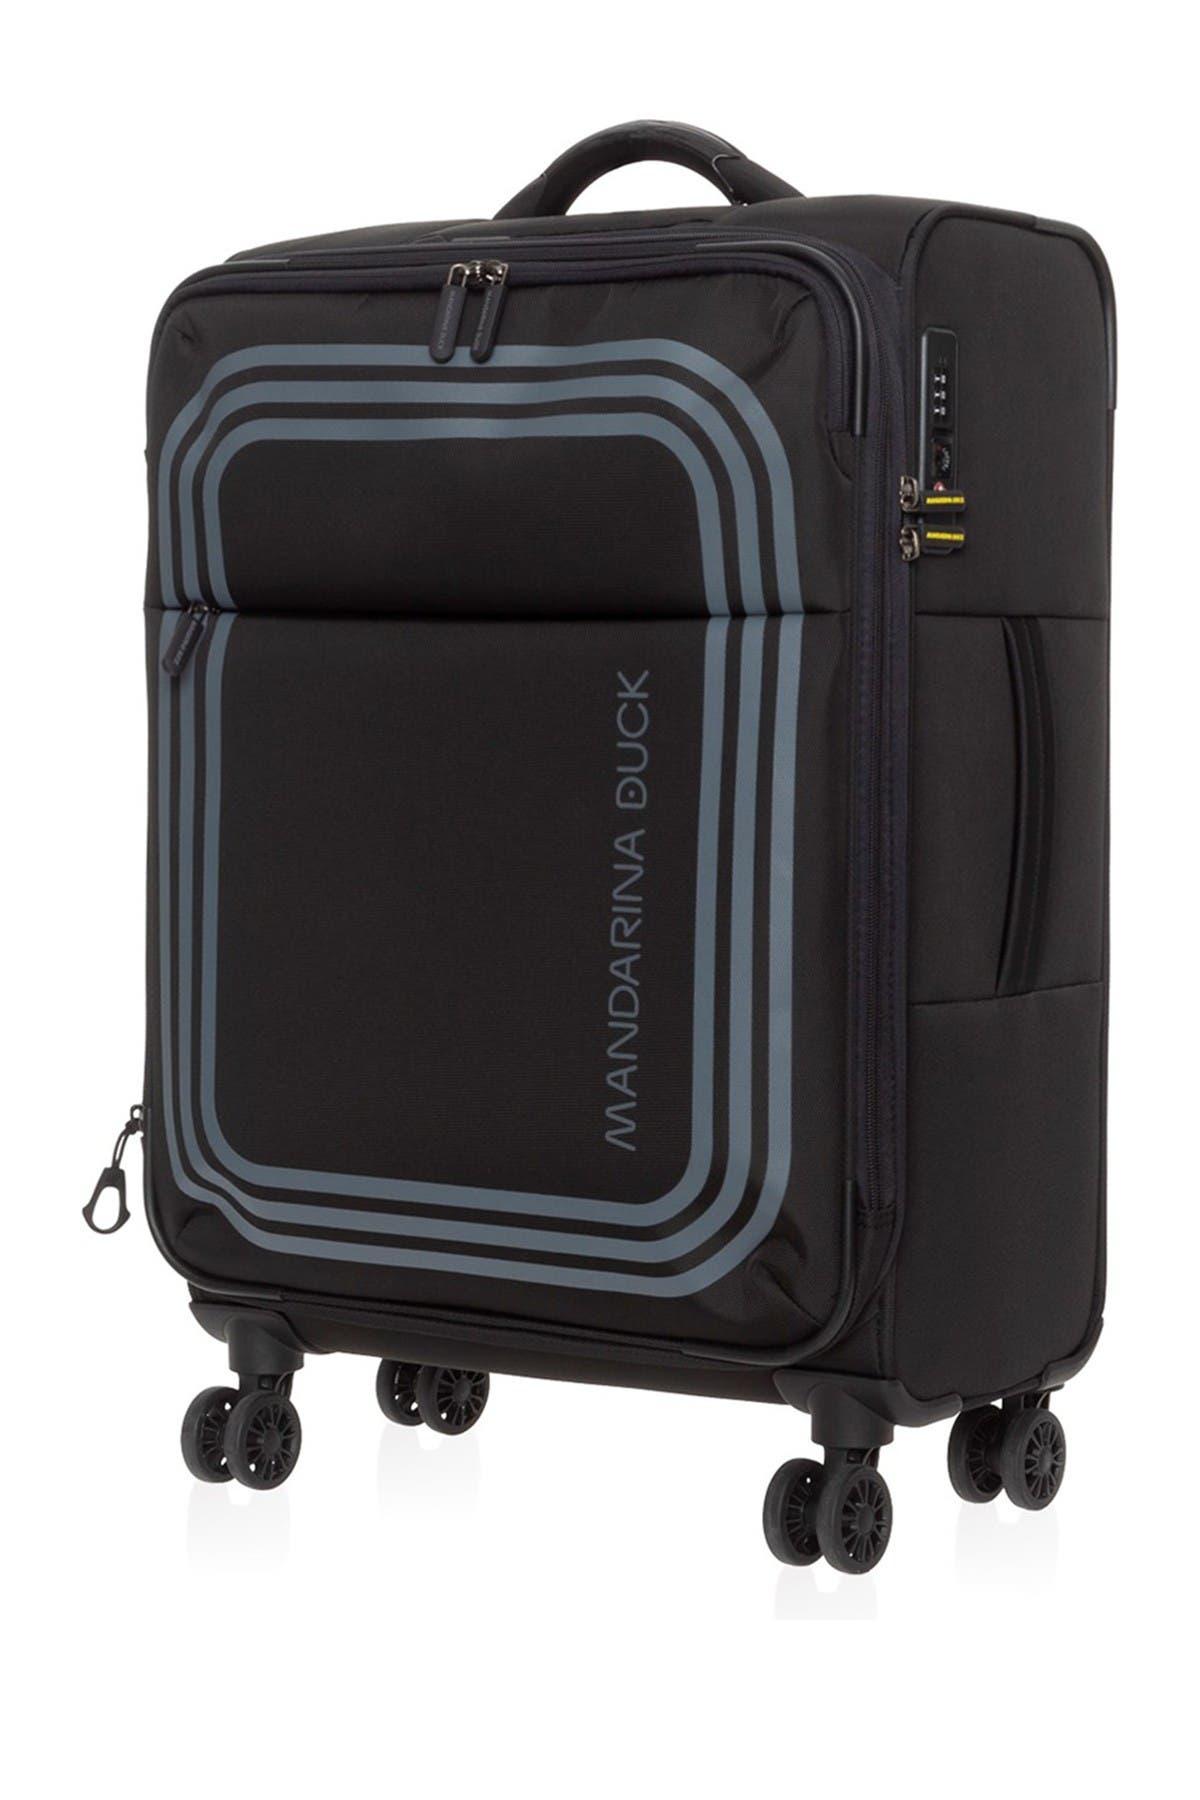 Image of MANDARINA DUCK Bilbao Medium Trolley Luggage